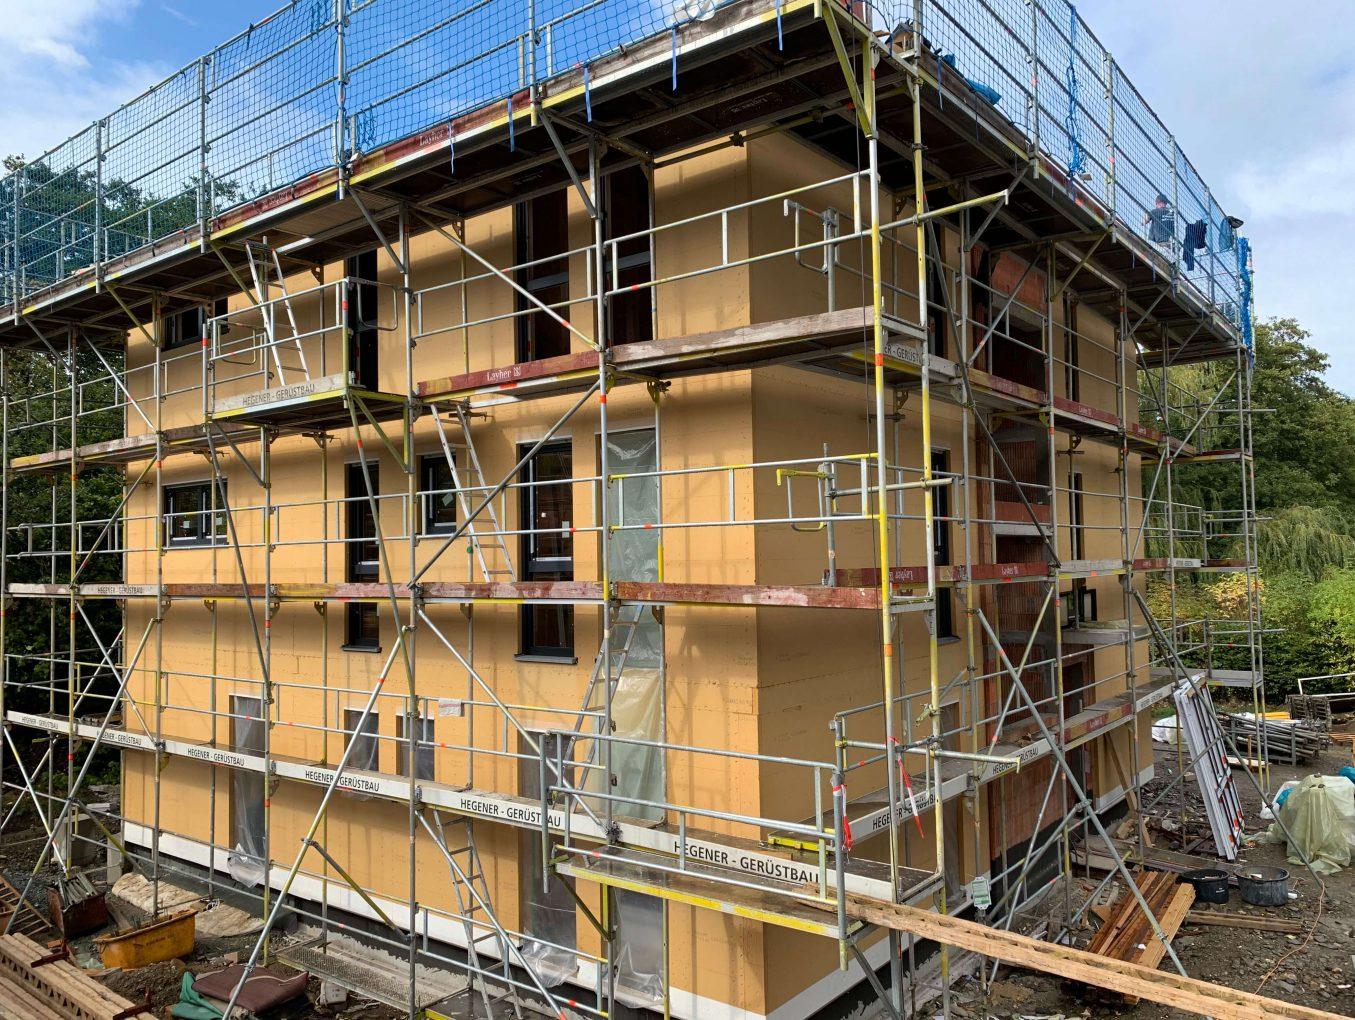 Mehrfamilienhäuser in Holzrahmenbauweise